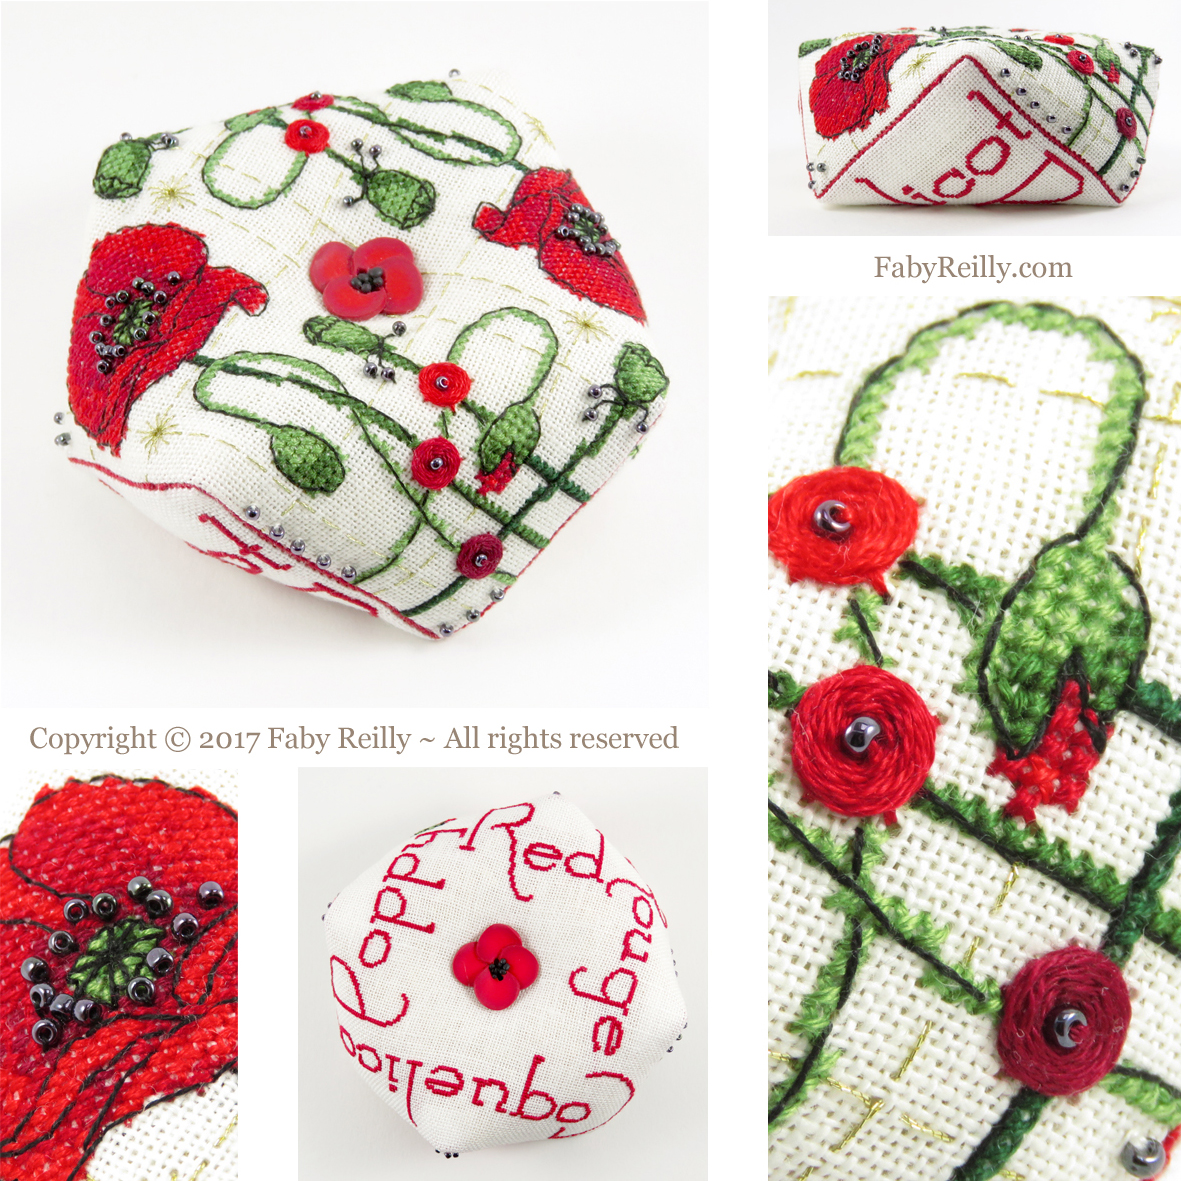 Poppy biscornu faby reilly designs